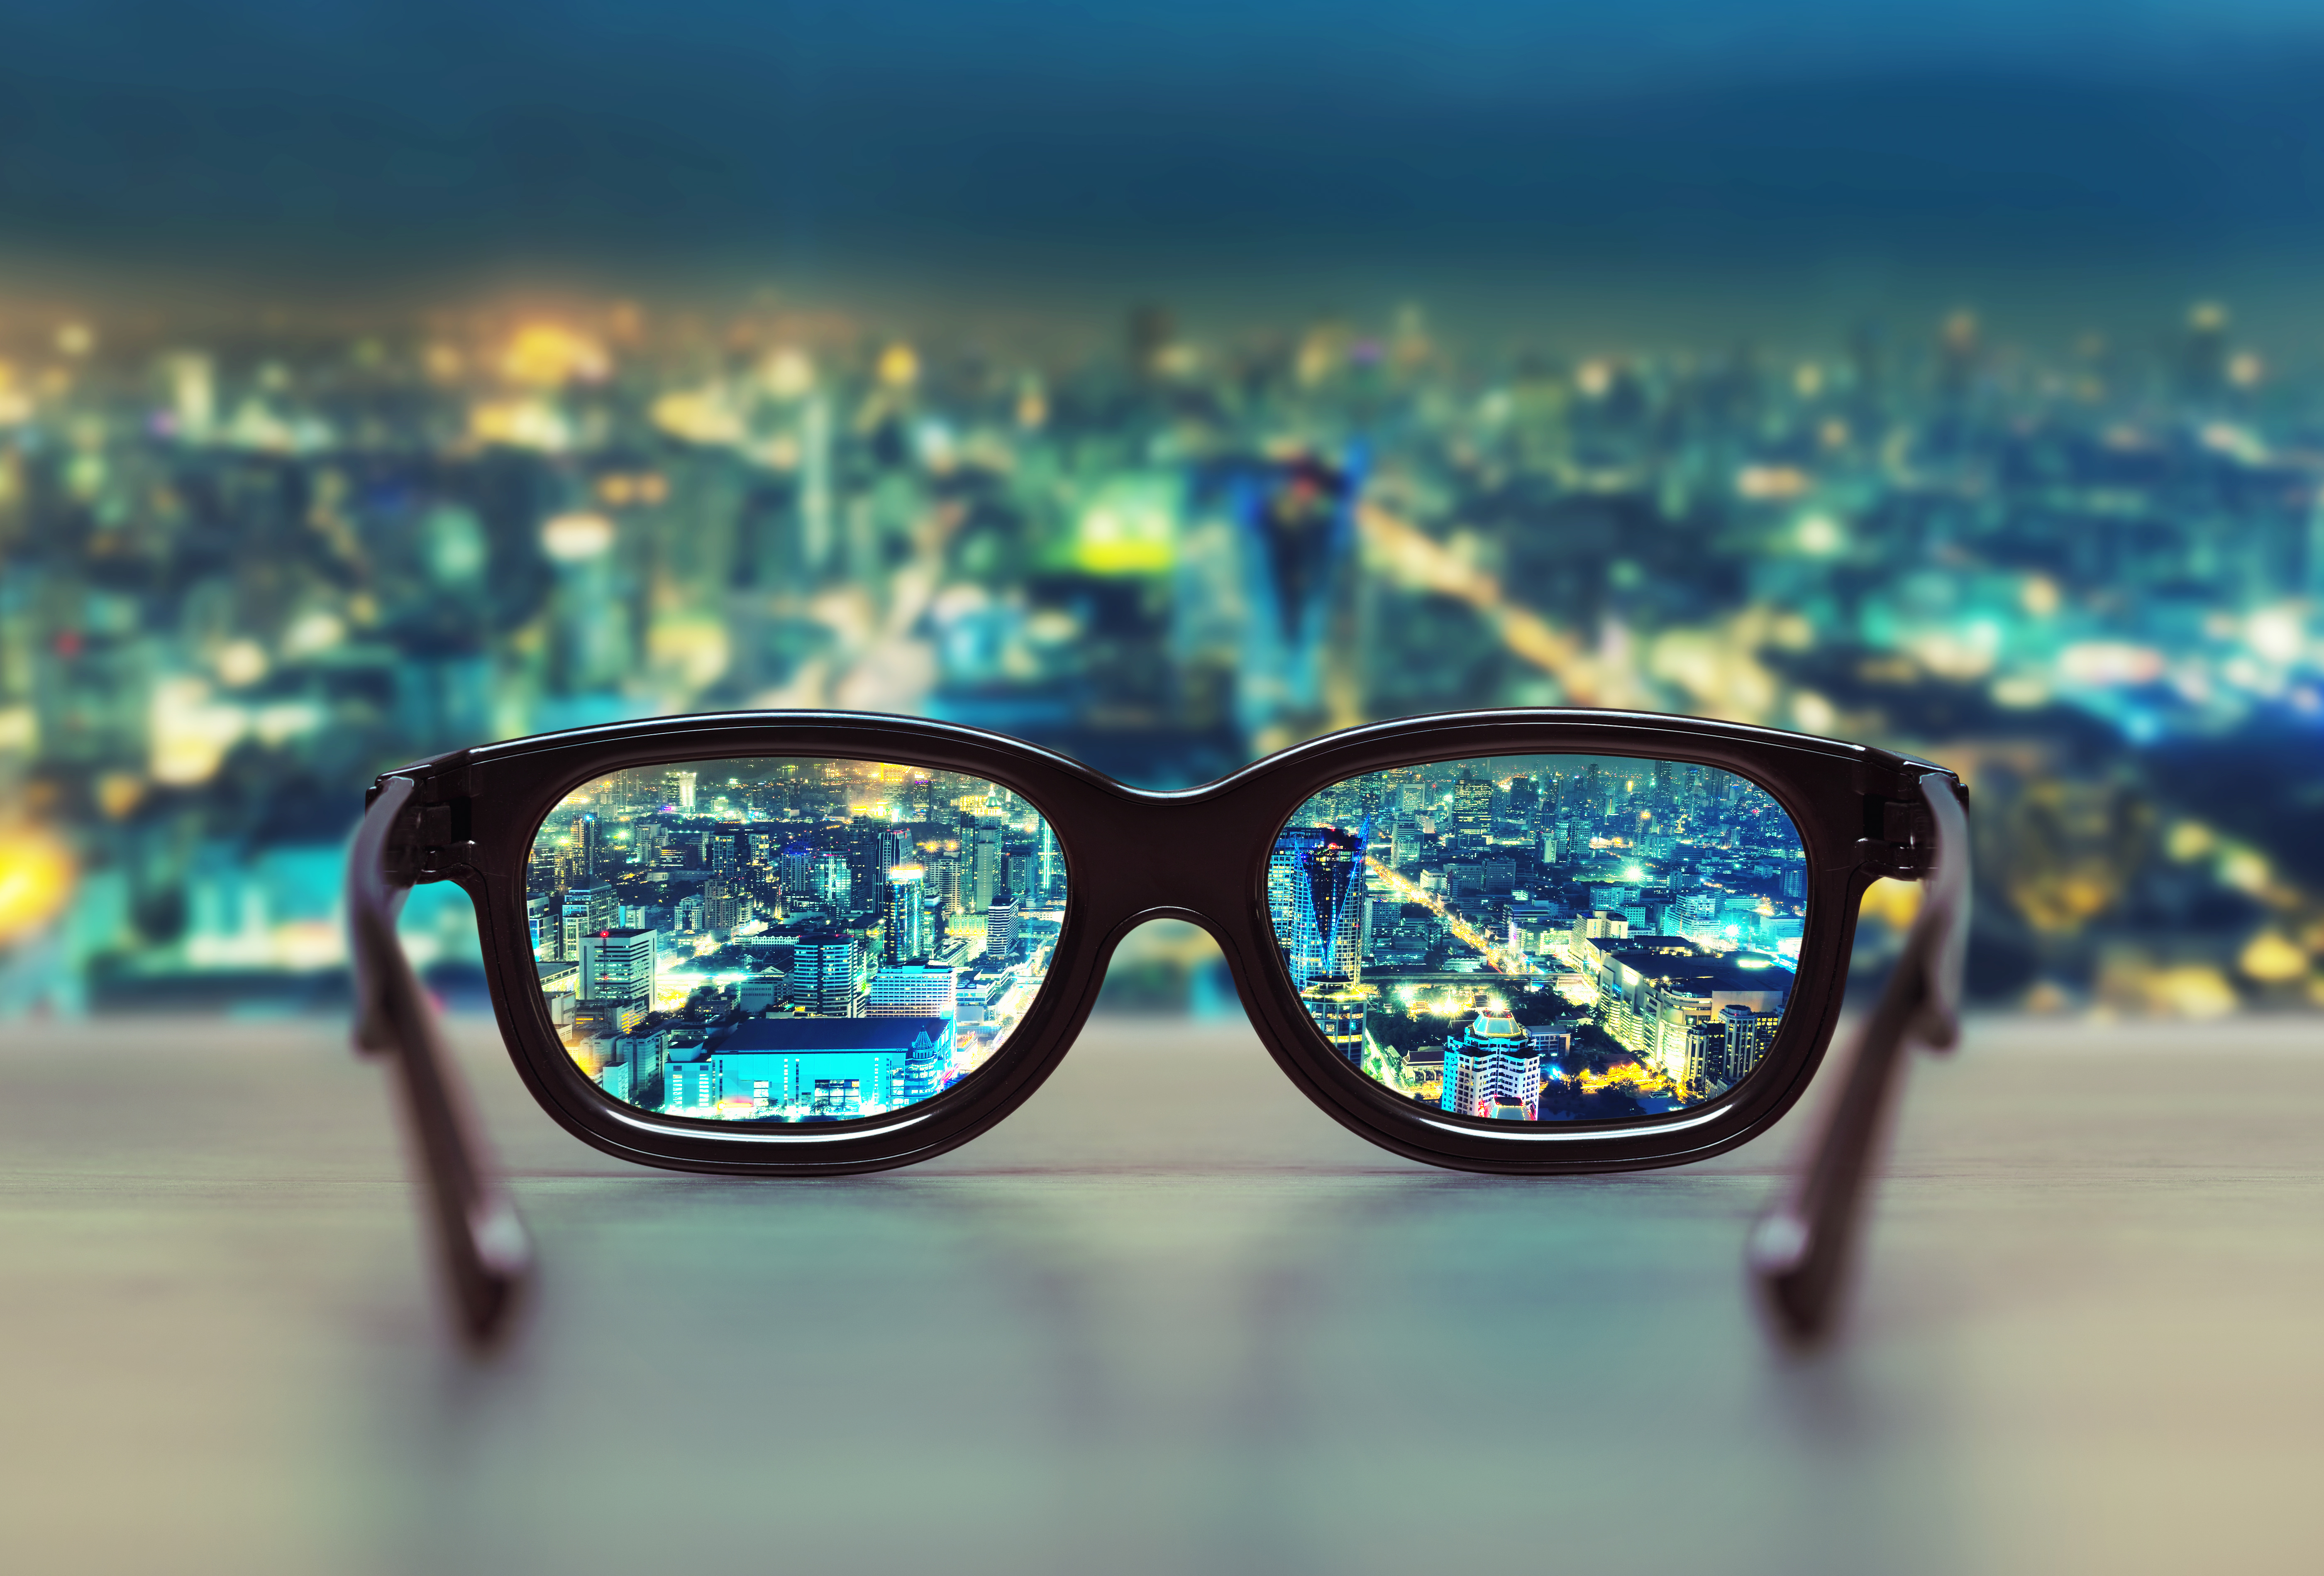 migliori-lenti-per-occhali-di-astigmatici